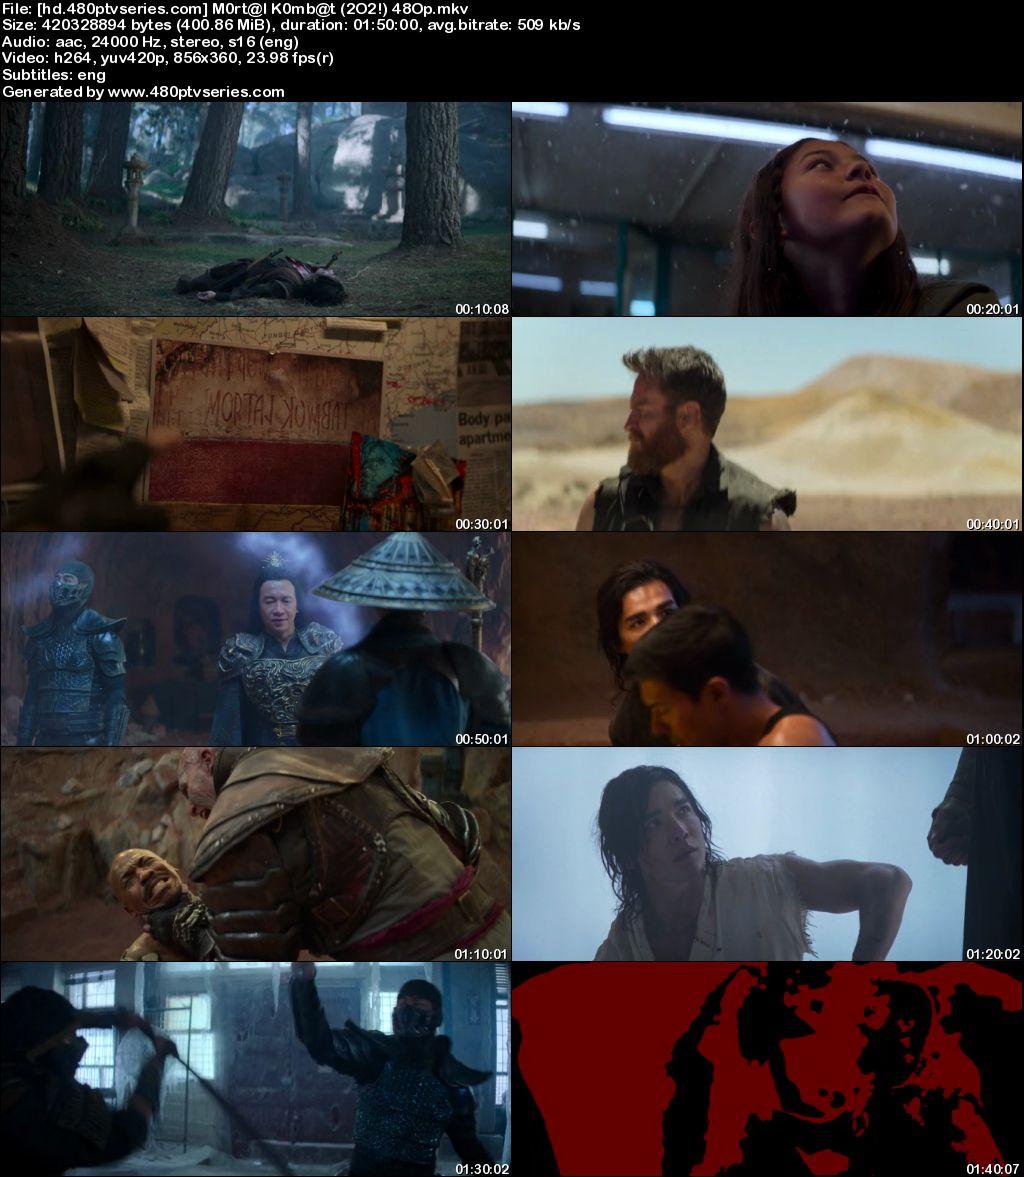 Mortal Kombat (2021) 400MB Full English Movie Download 480p Web-DL Free Watch Online Full Movie Download Worldfree4u 9xmovies